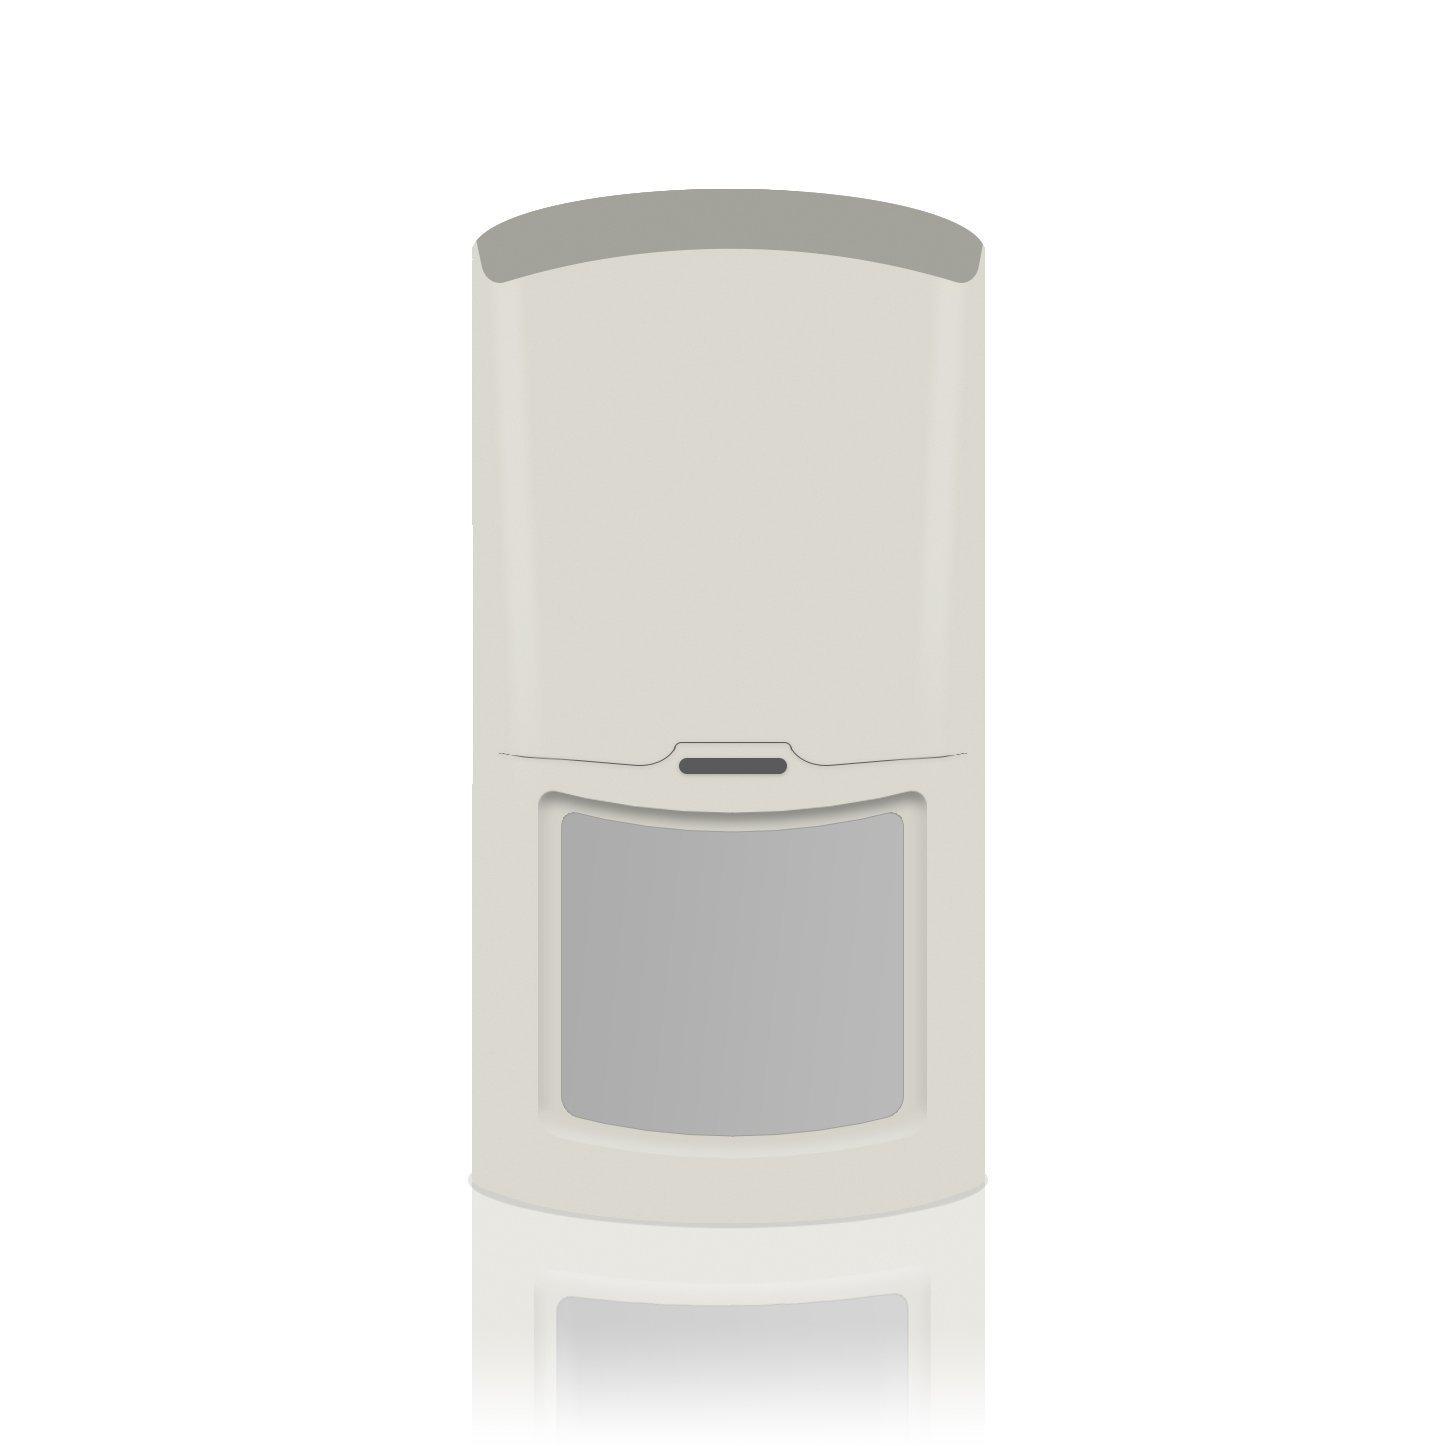 Sensor de movimiento PIR volumétrico inalámbrico alarma para ...